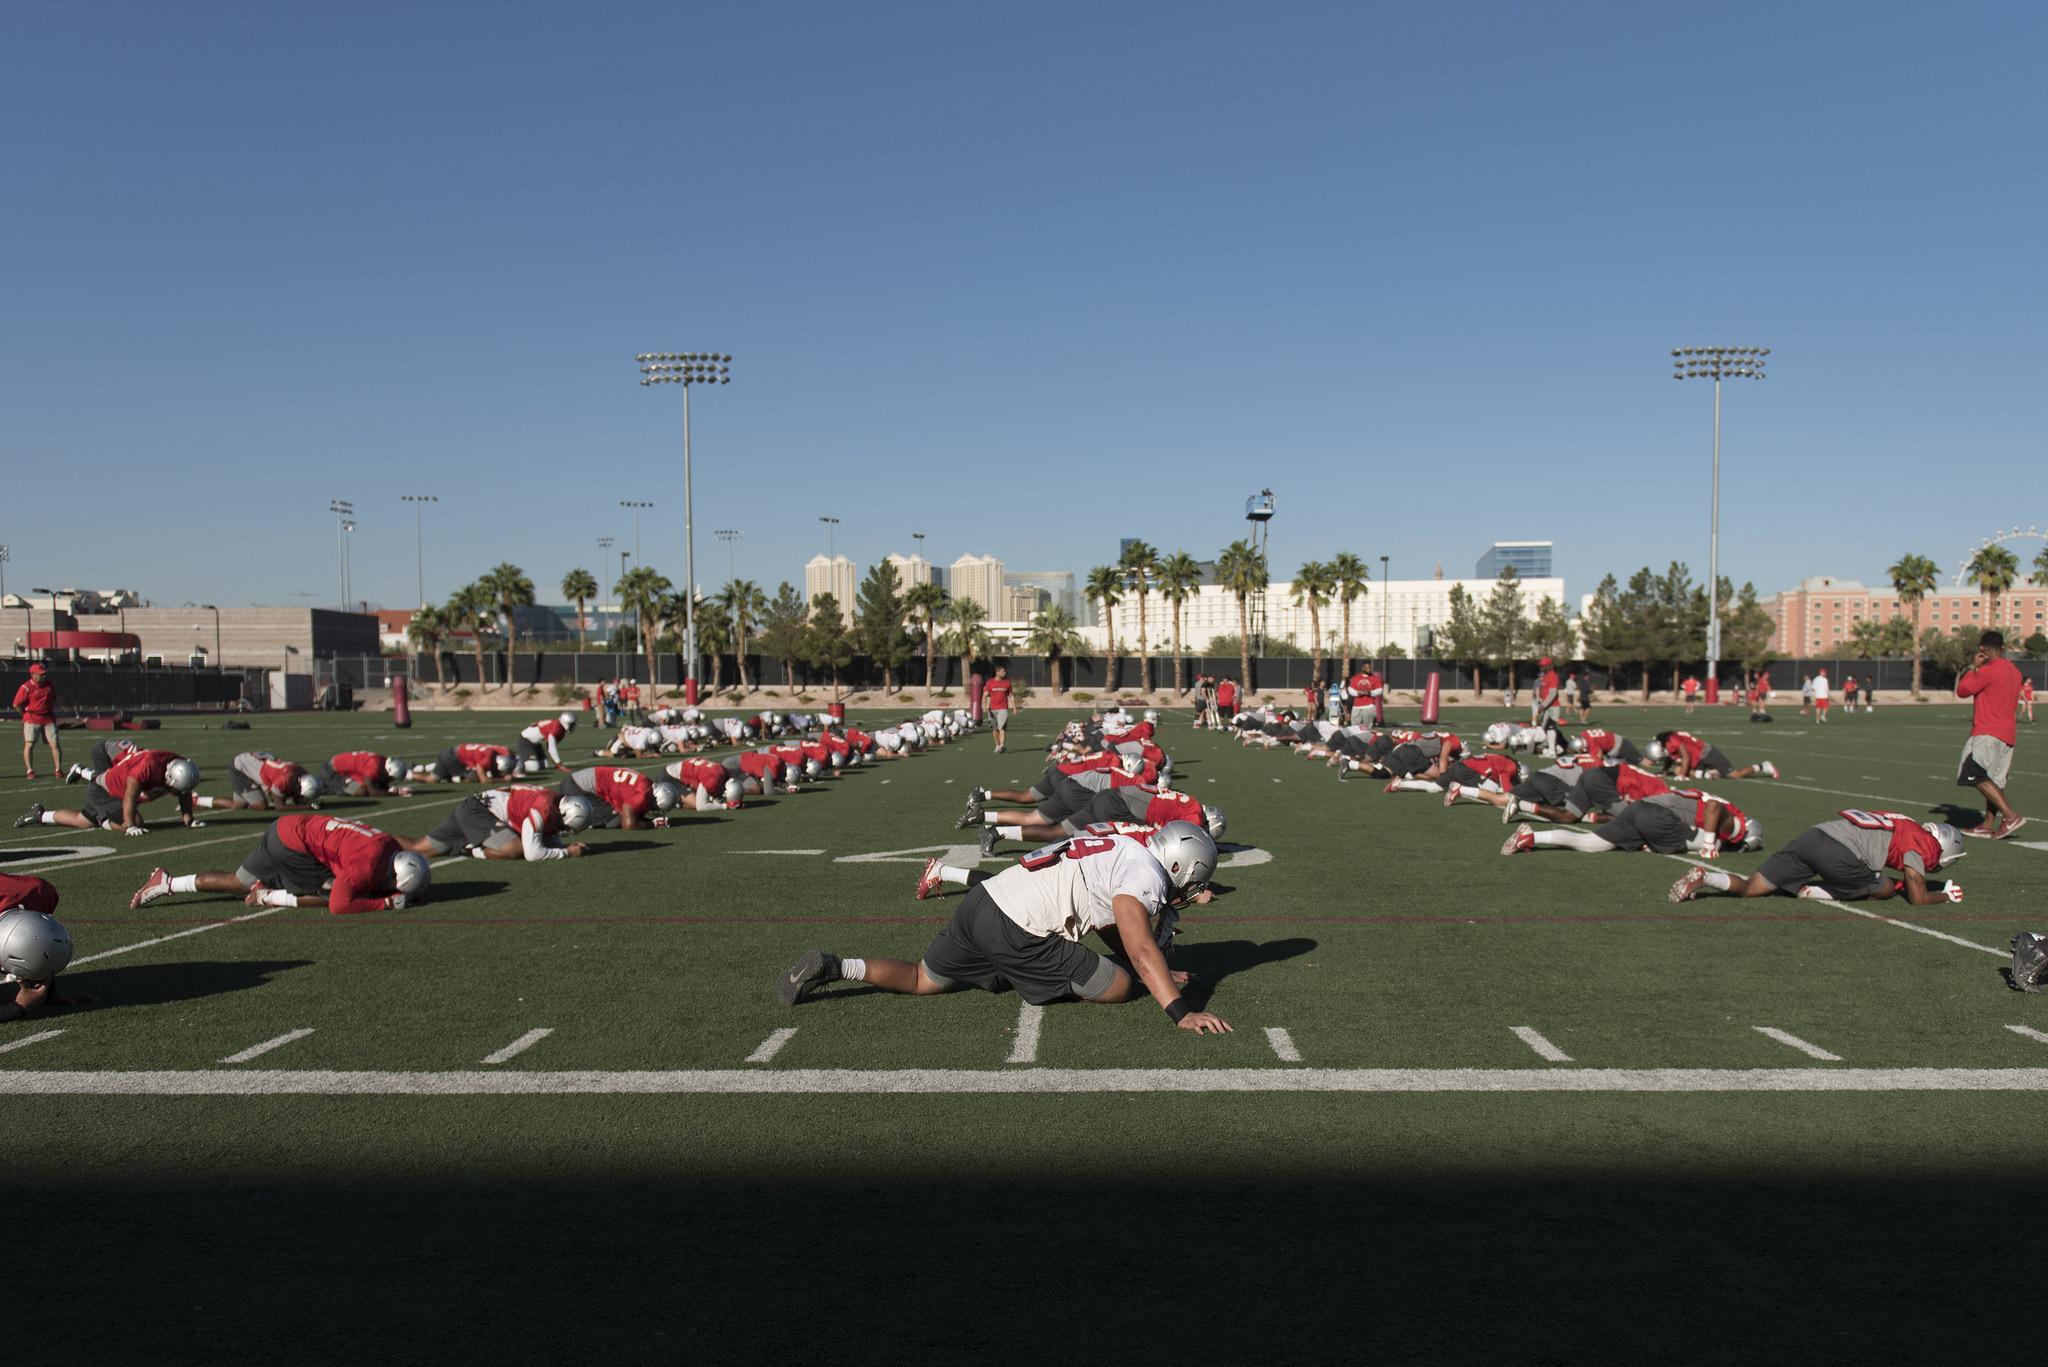 Players stretch during football practice at UNLV's Rebel Park in Las Vegas, Tuesday, Sept. 27, 2016. Jason Ogulnik/Las Vegas Review-Journal